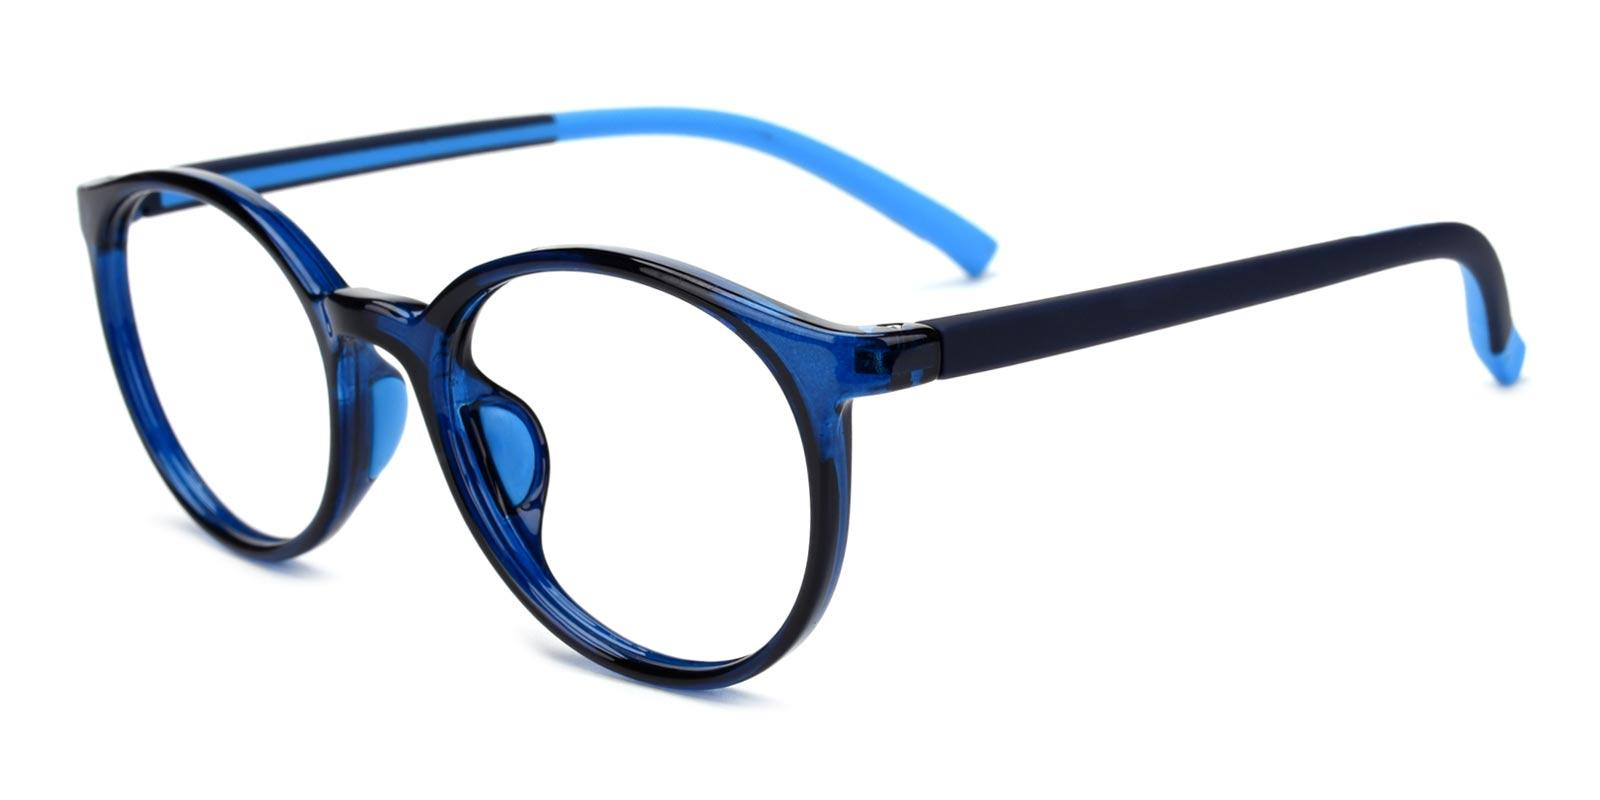 Alex-Pattern-Oval-Plastic-Eyeglasses-detail